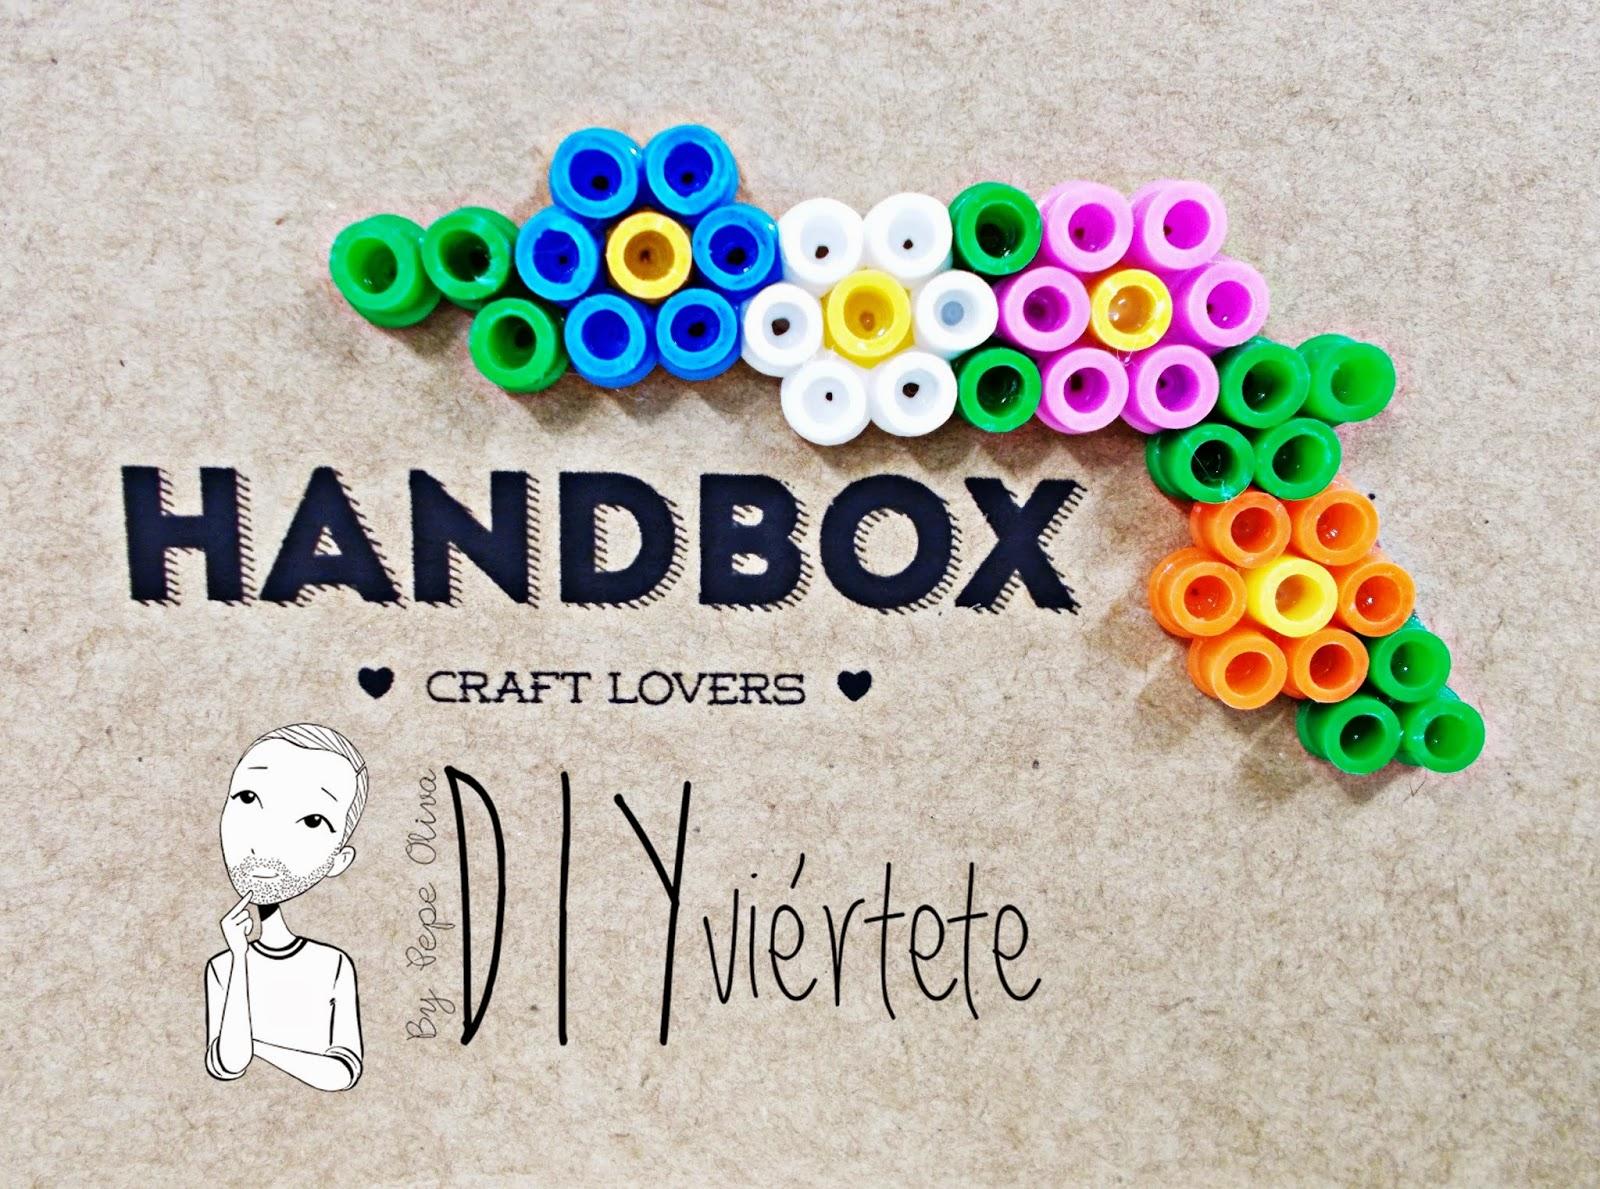 DIY-Do It Yourself-caja-cartón-selfpackaging-customizar-handbox-yodona-diyhuntersday-craftlovers-5